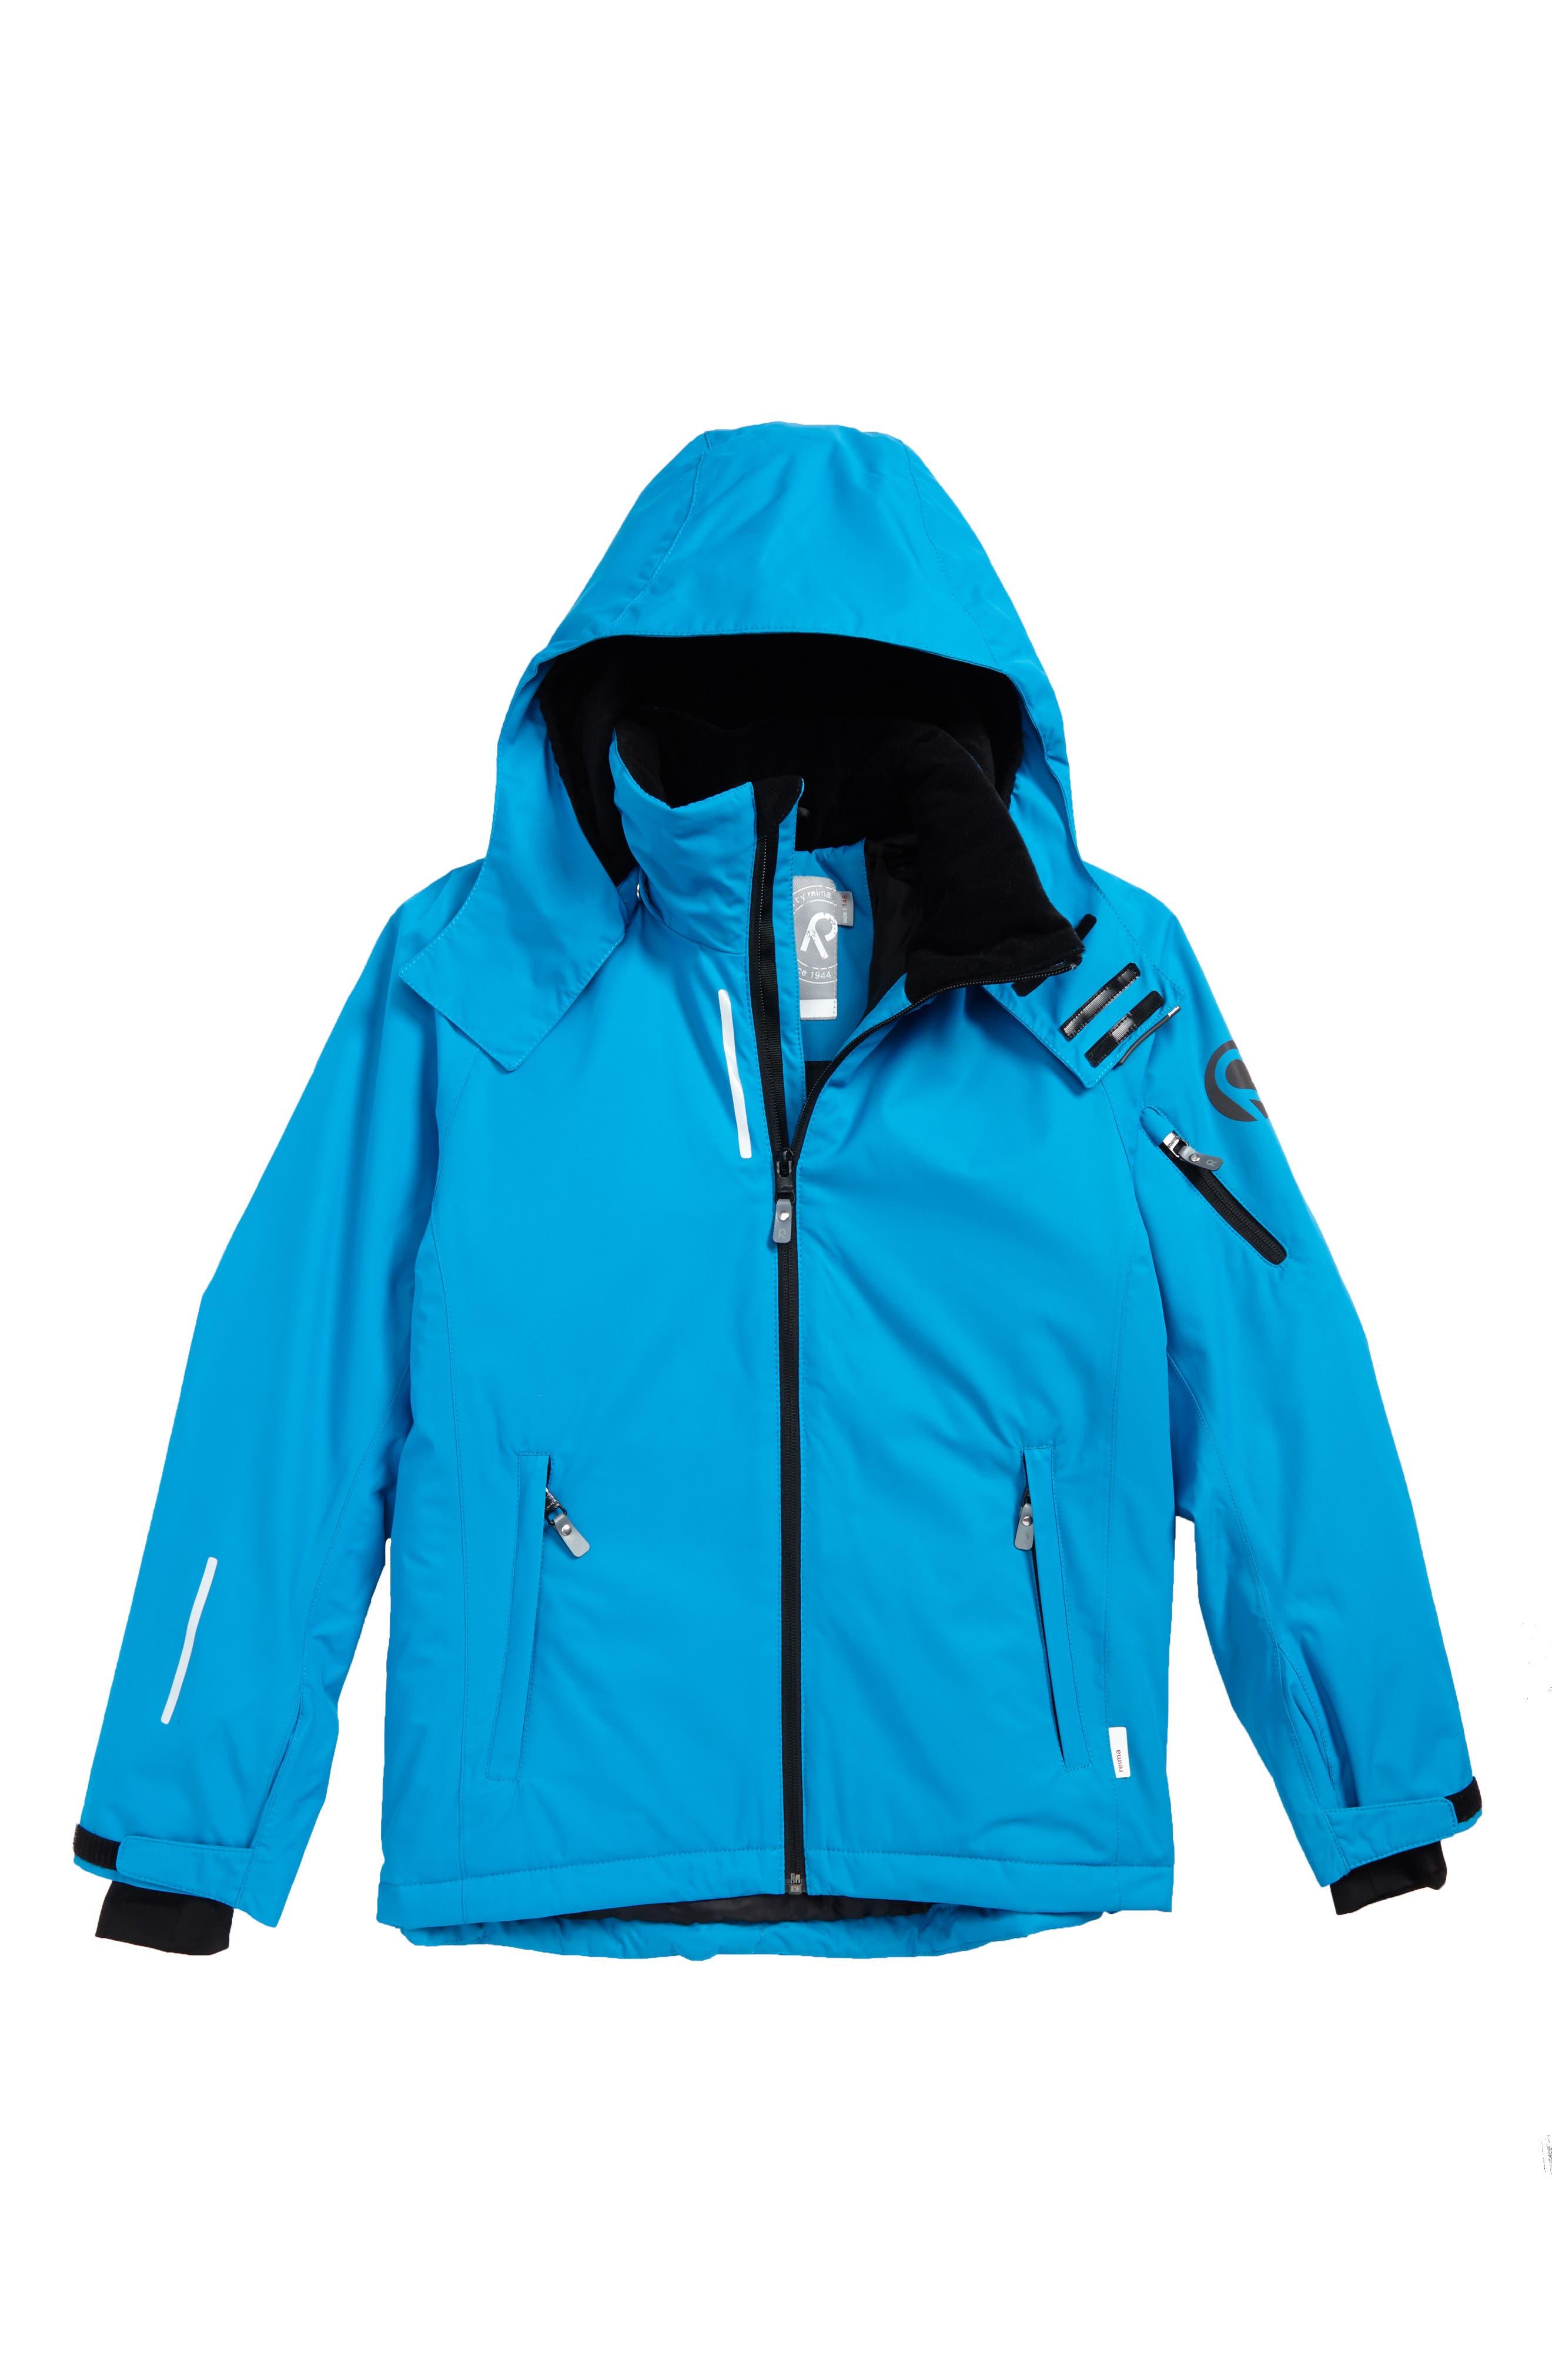 Reimatec<sup>®</sup> Detour Waterproof Hooded Jacket,                             Main thumbnail 1, color,                             Blue